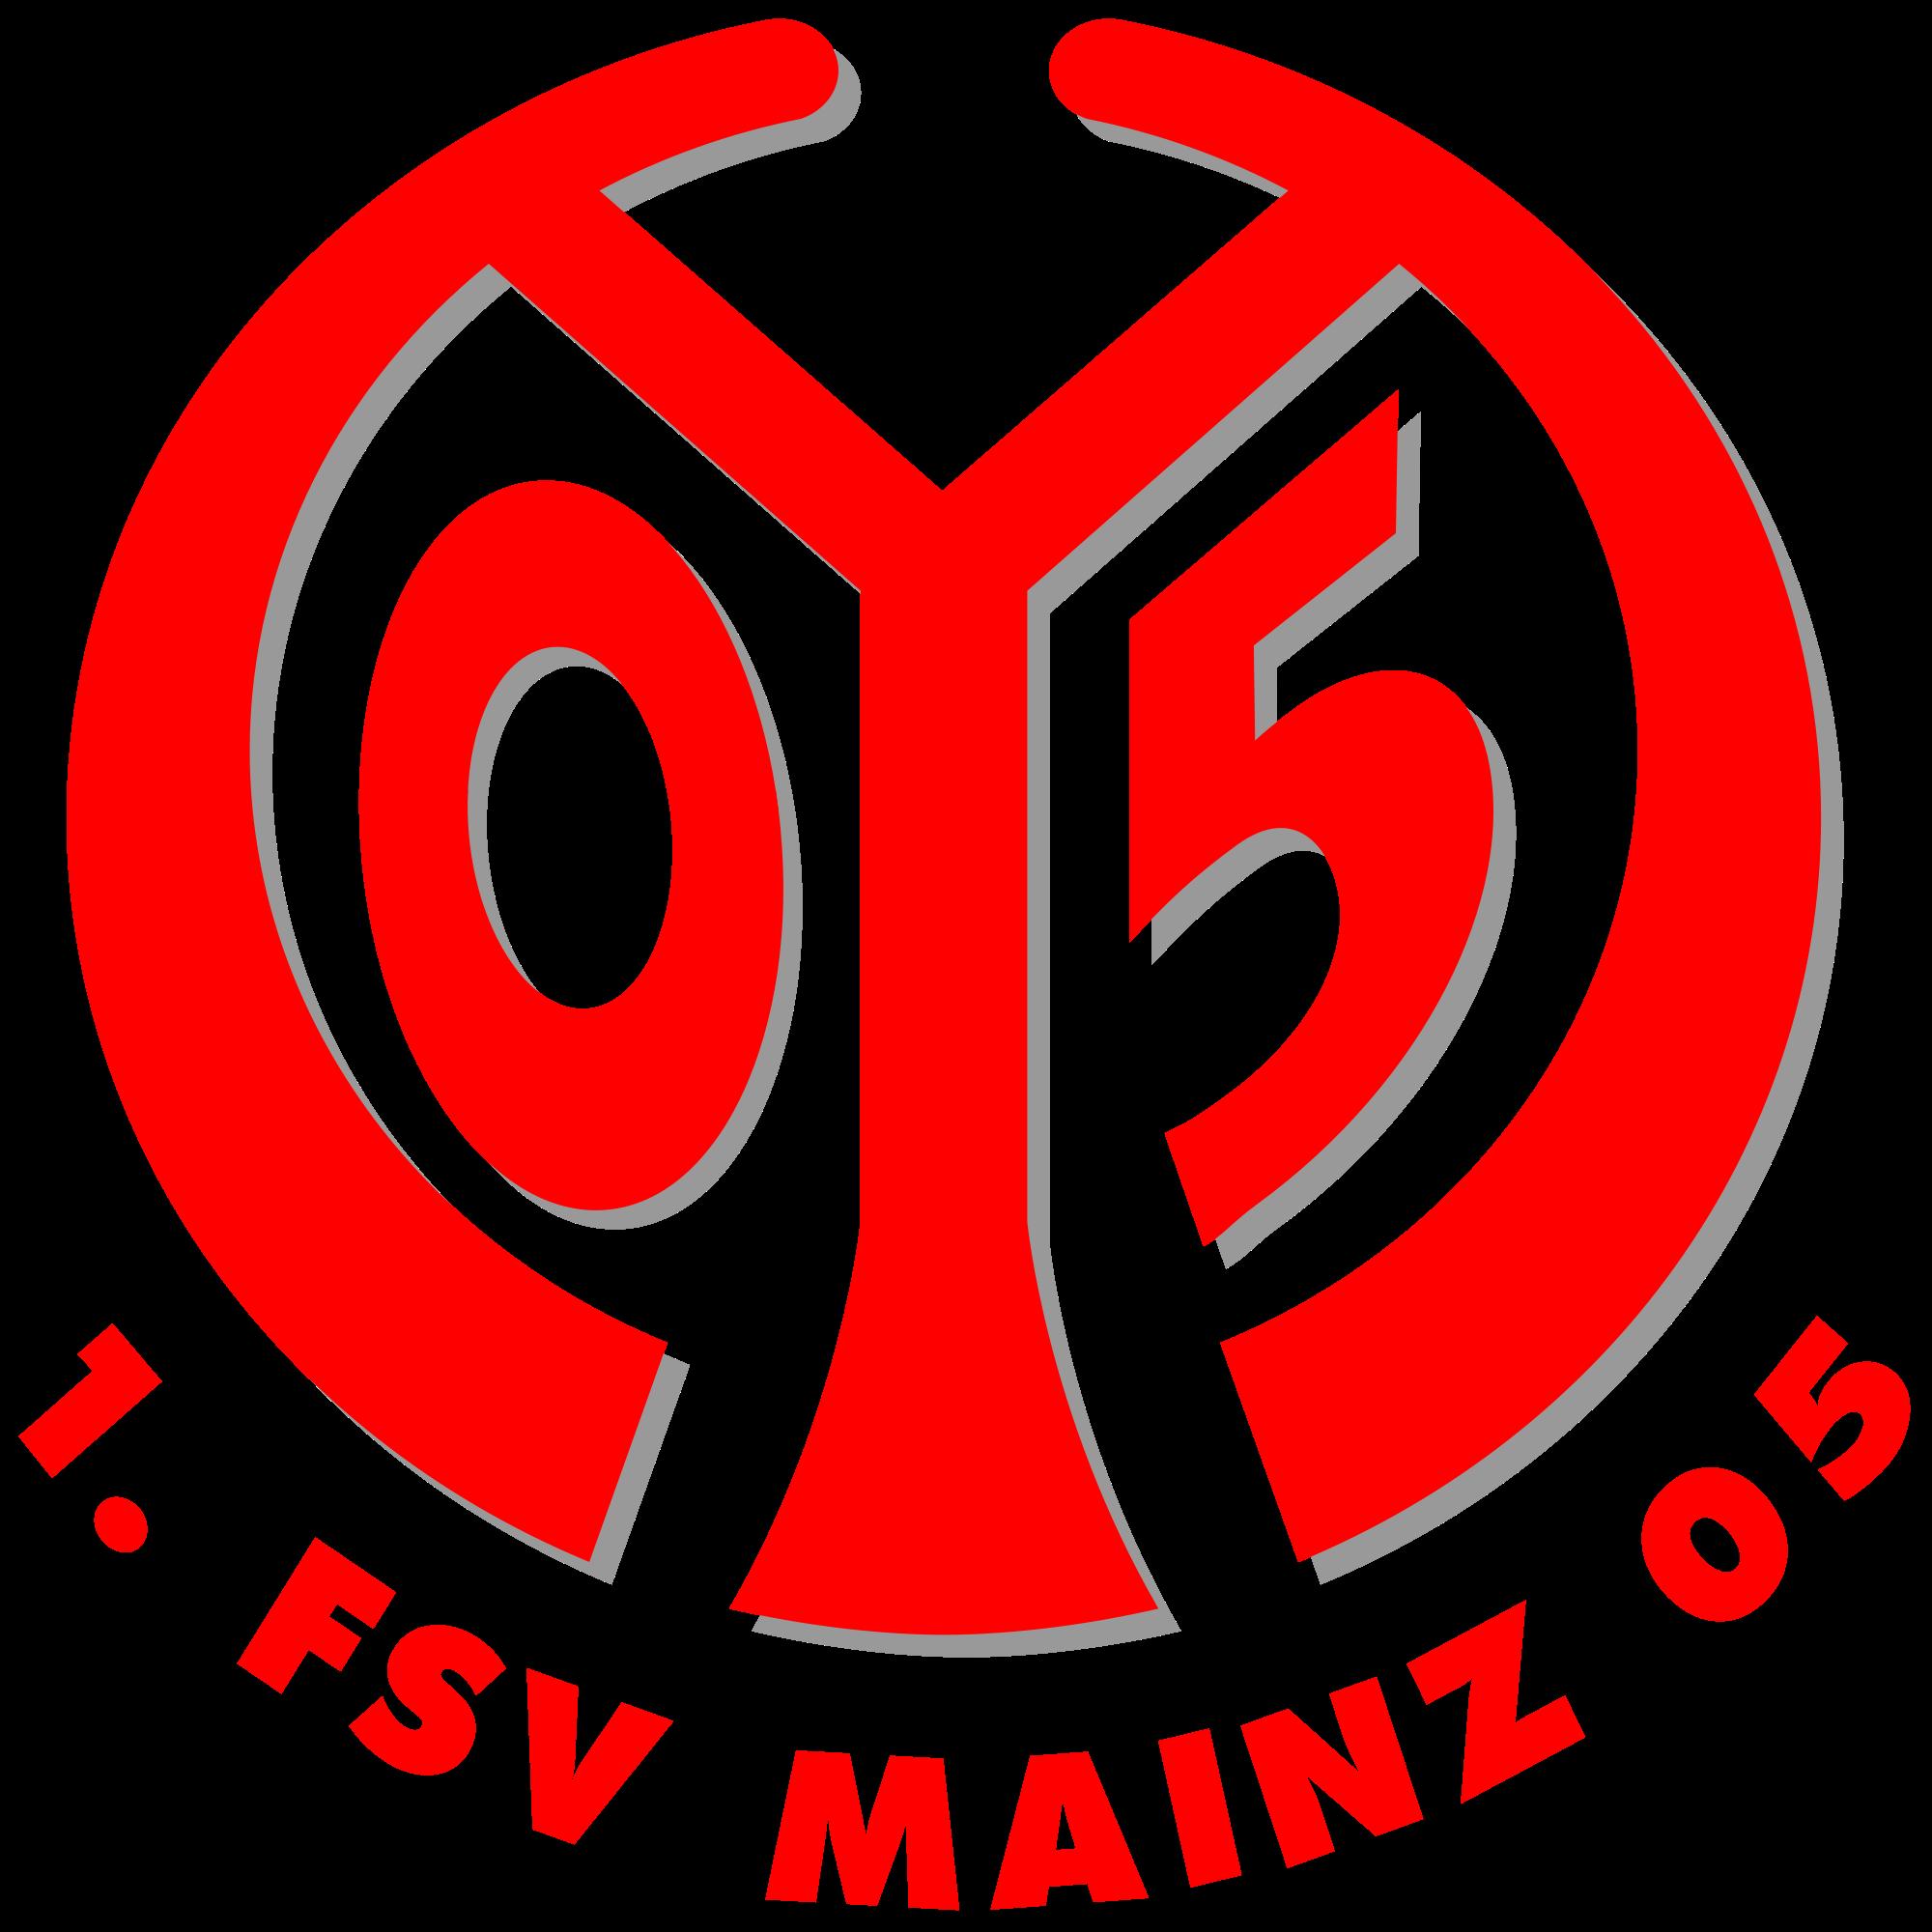 Datei:FSV Mainz 05 Logo.png – Wikipedia